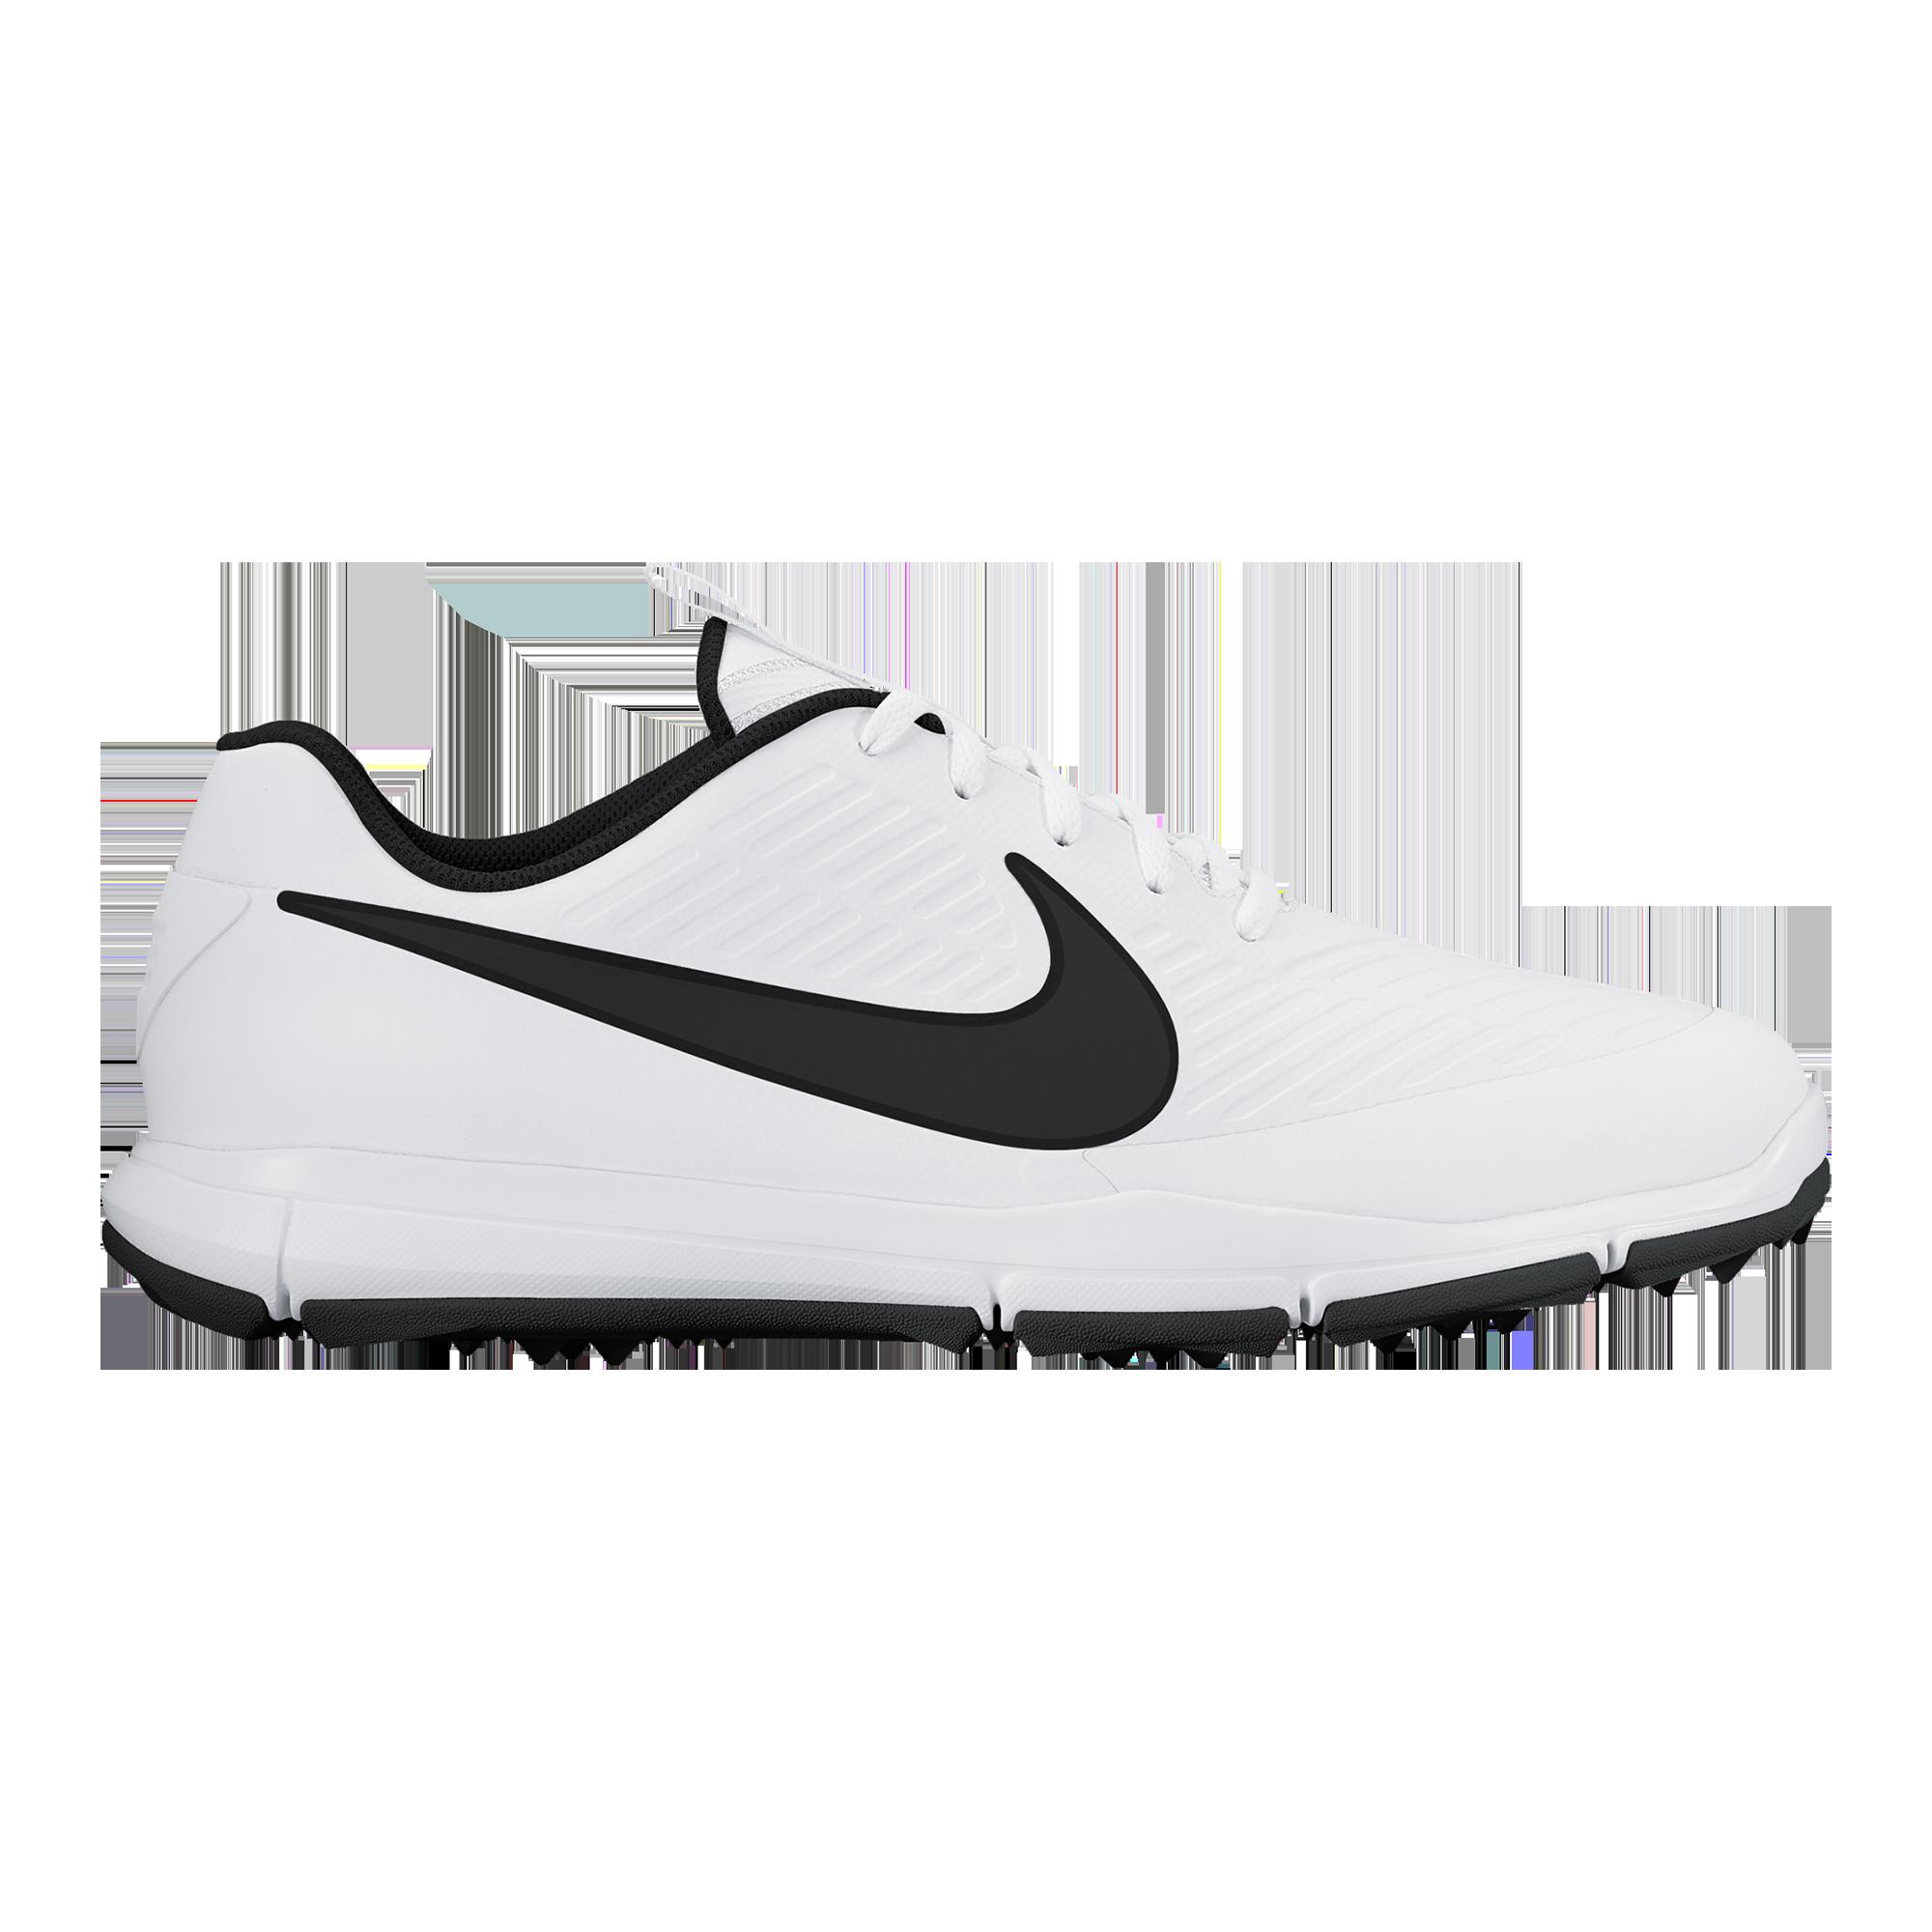 Nike Explorer 2 Men's Golf Shoe - White